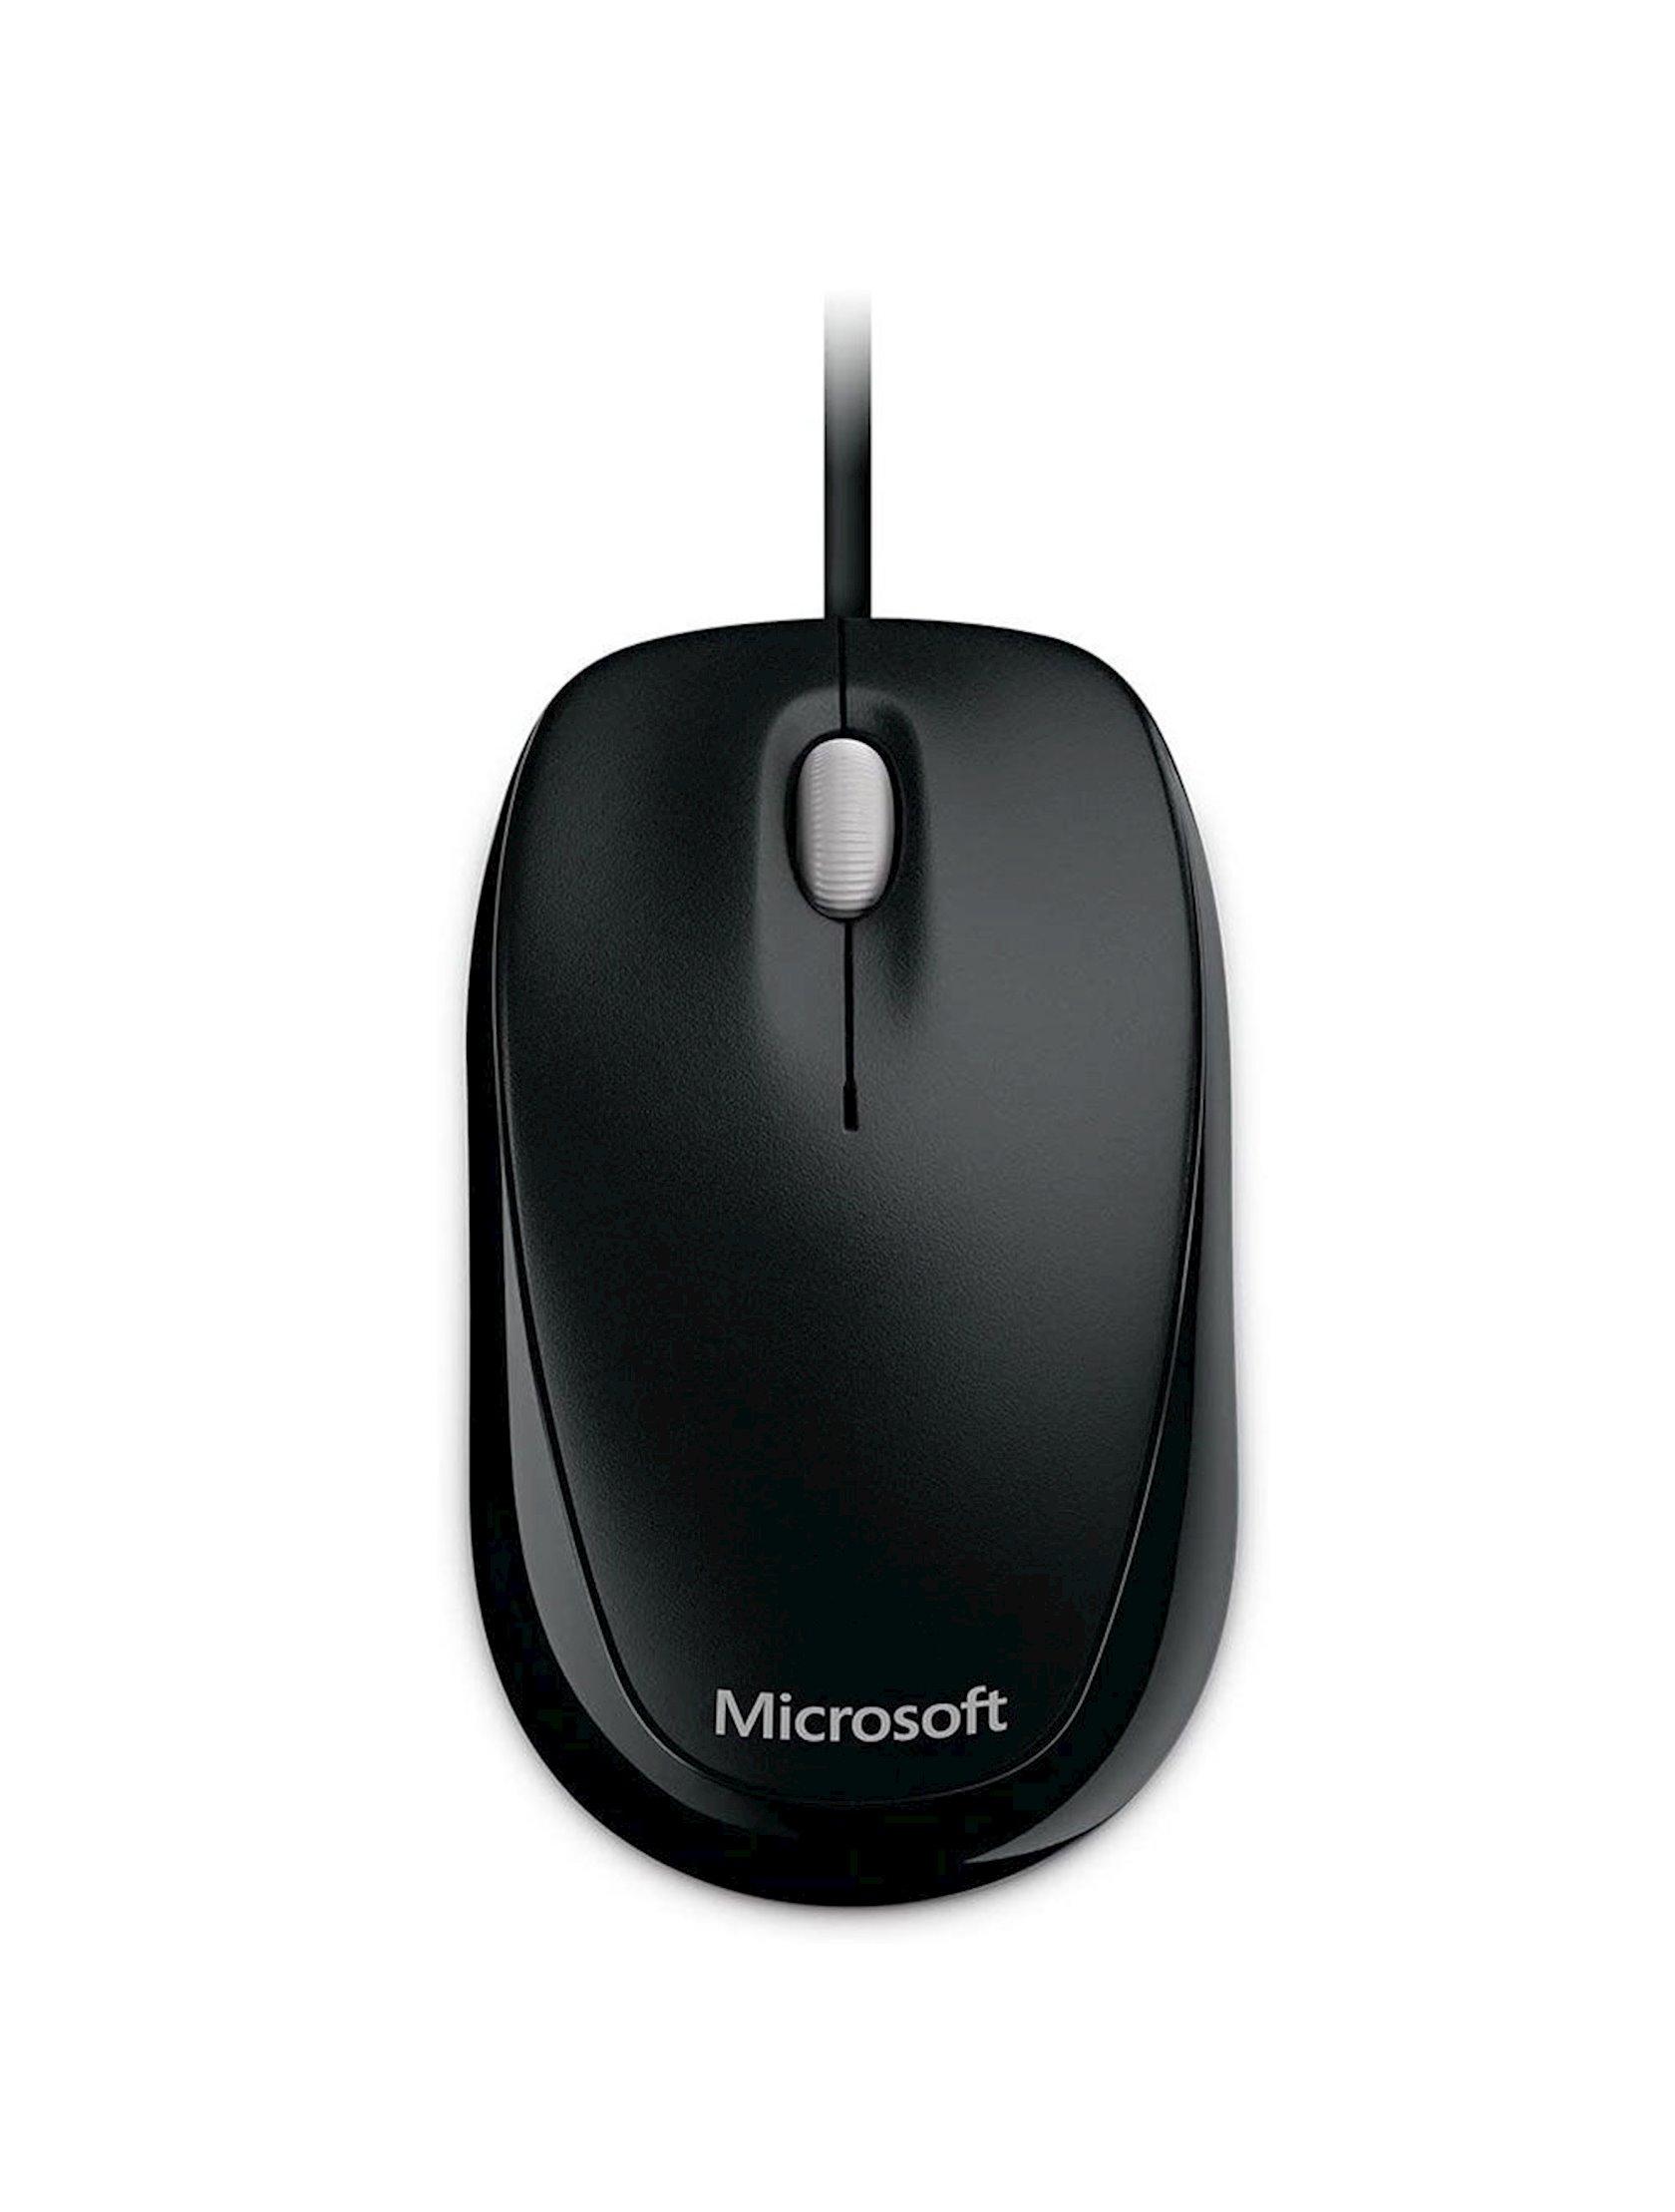 Simli siçan Microsoft 500 U81-00011